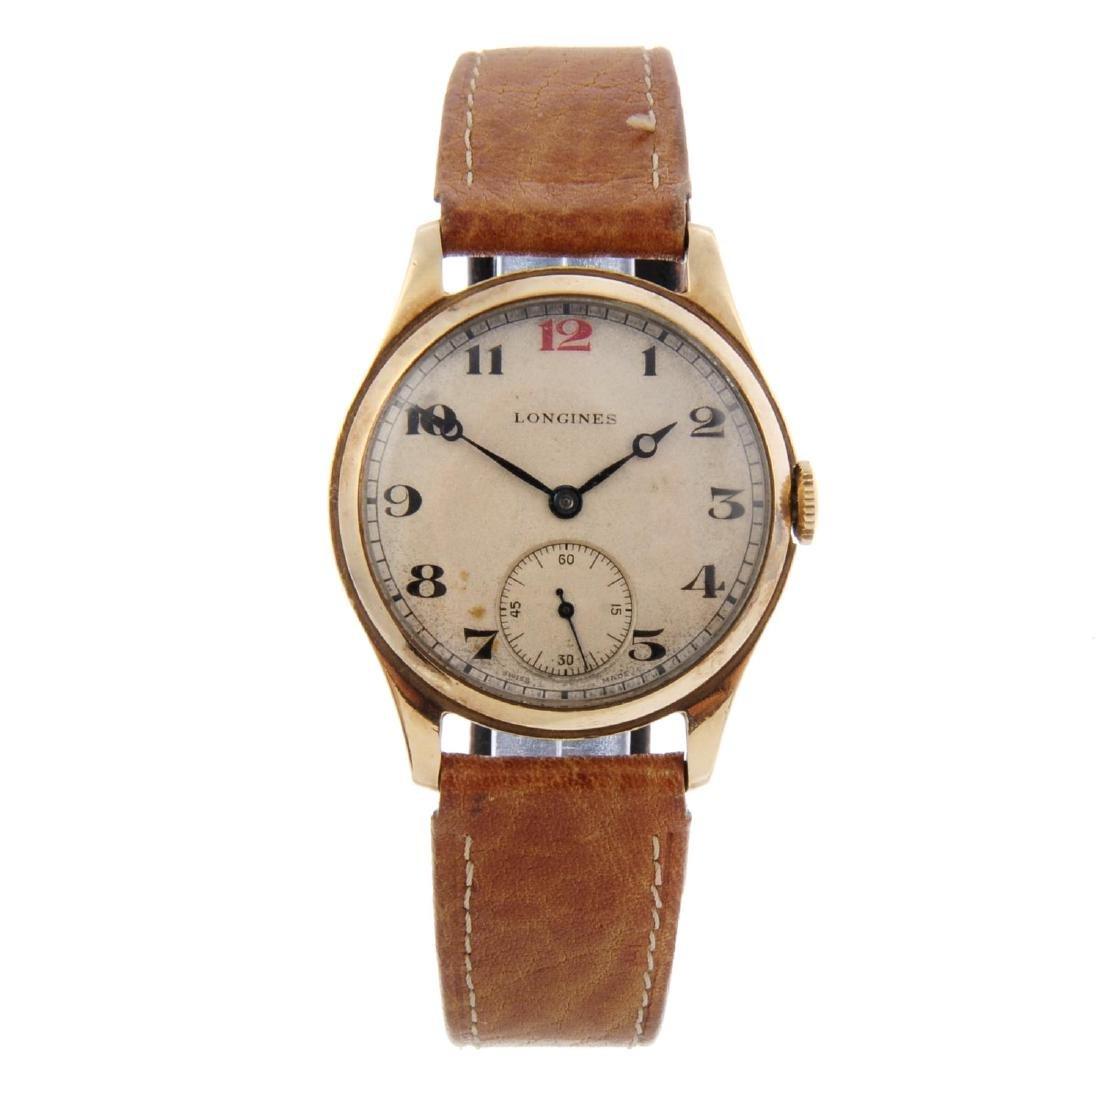 LONGINES - a gentleman's wrist watch. 9ct yellow gold